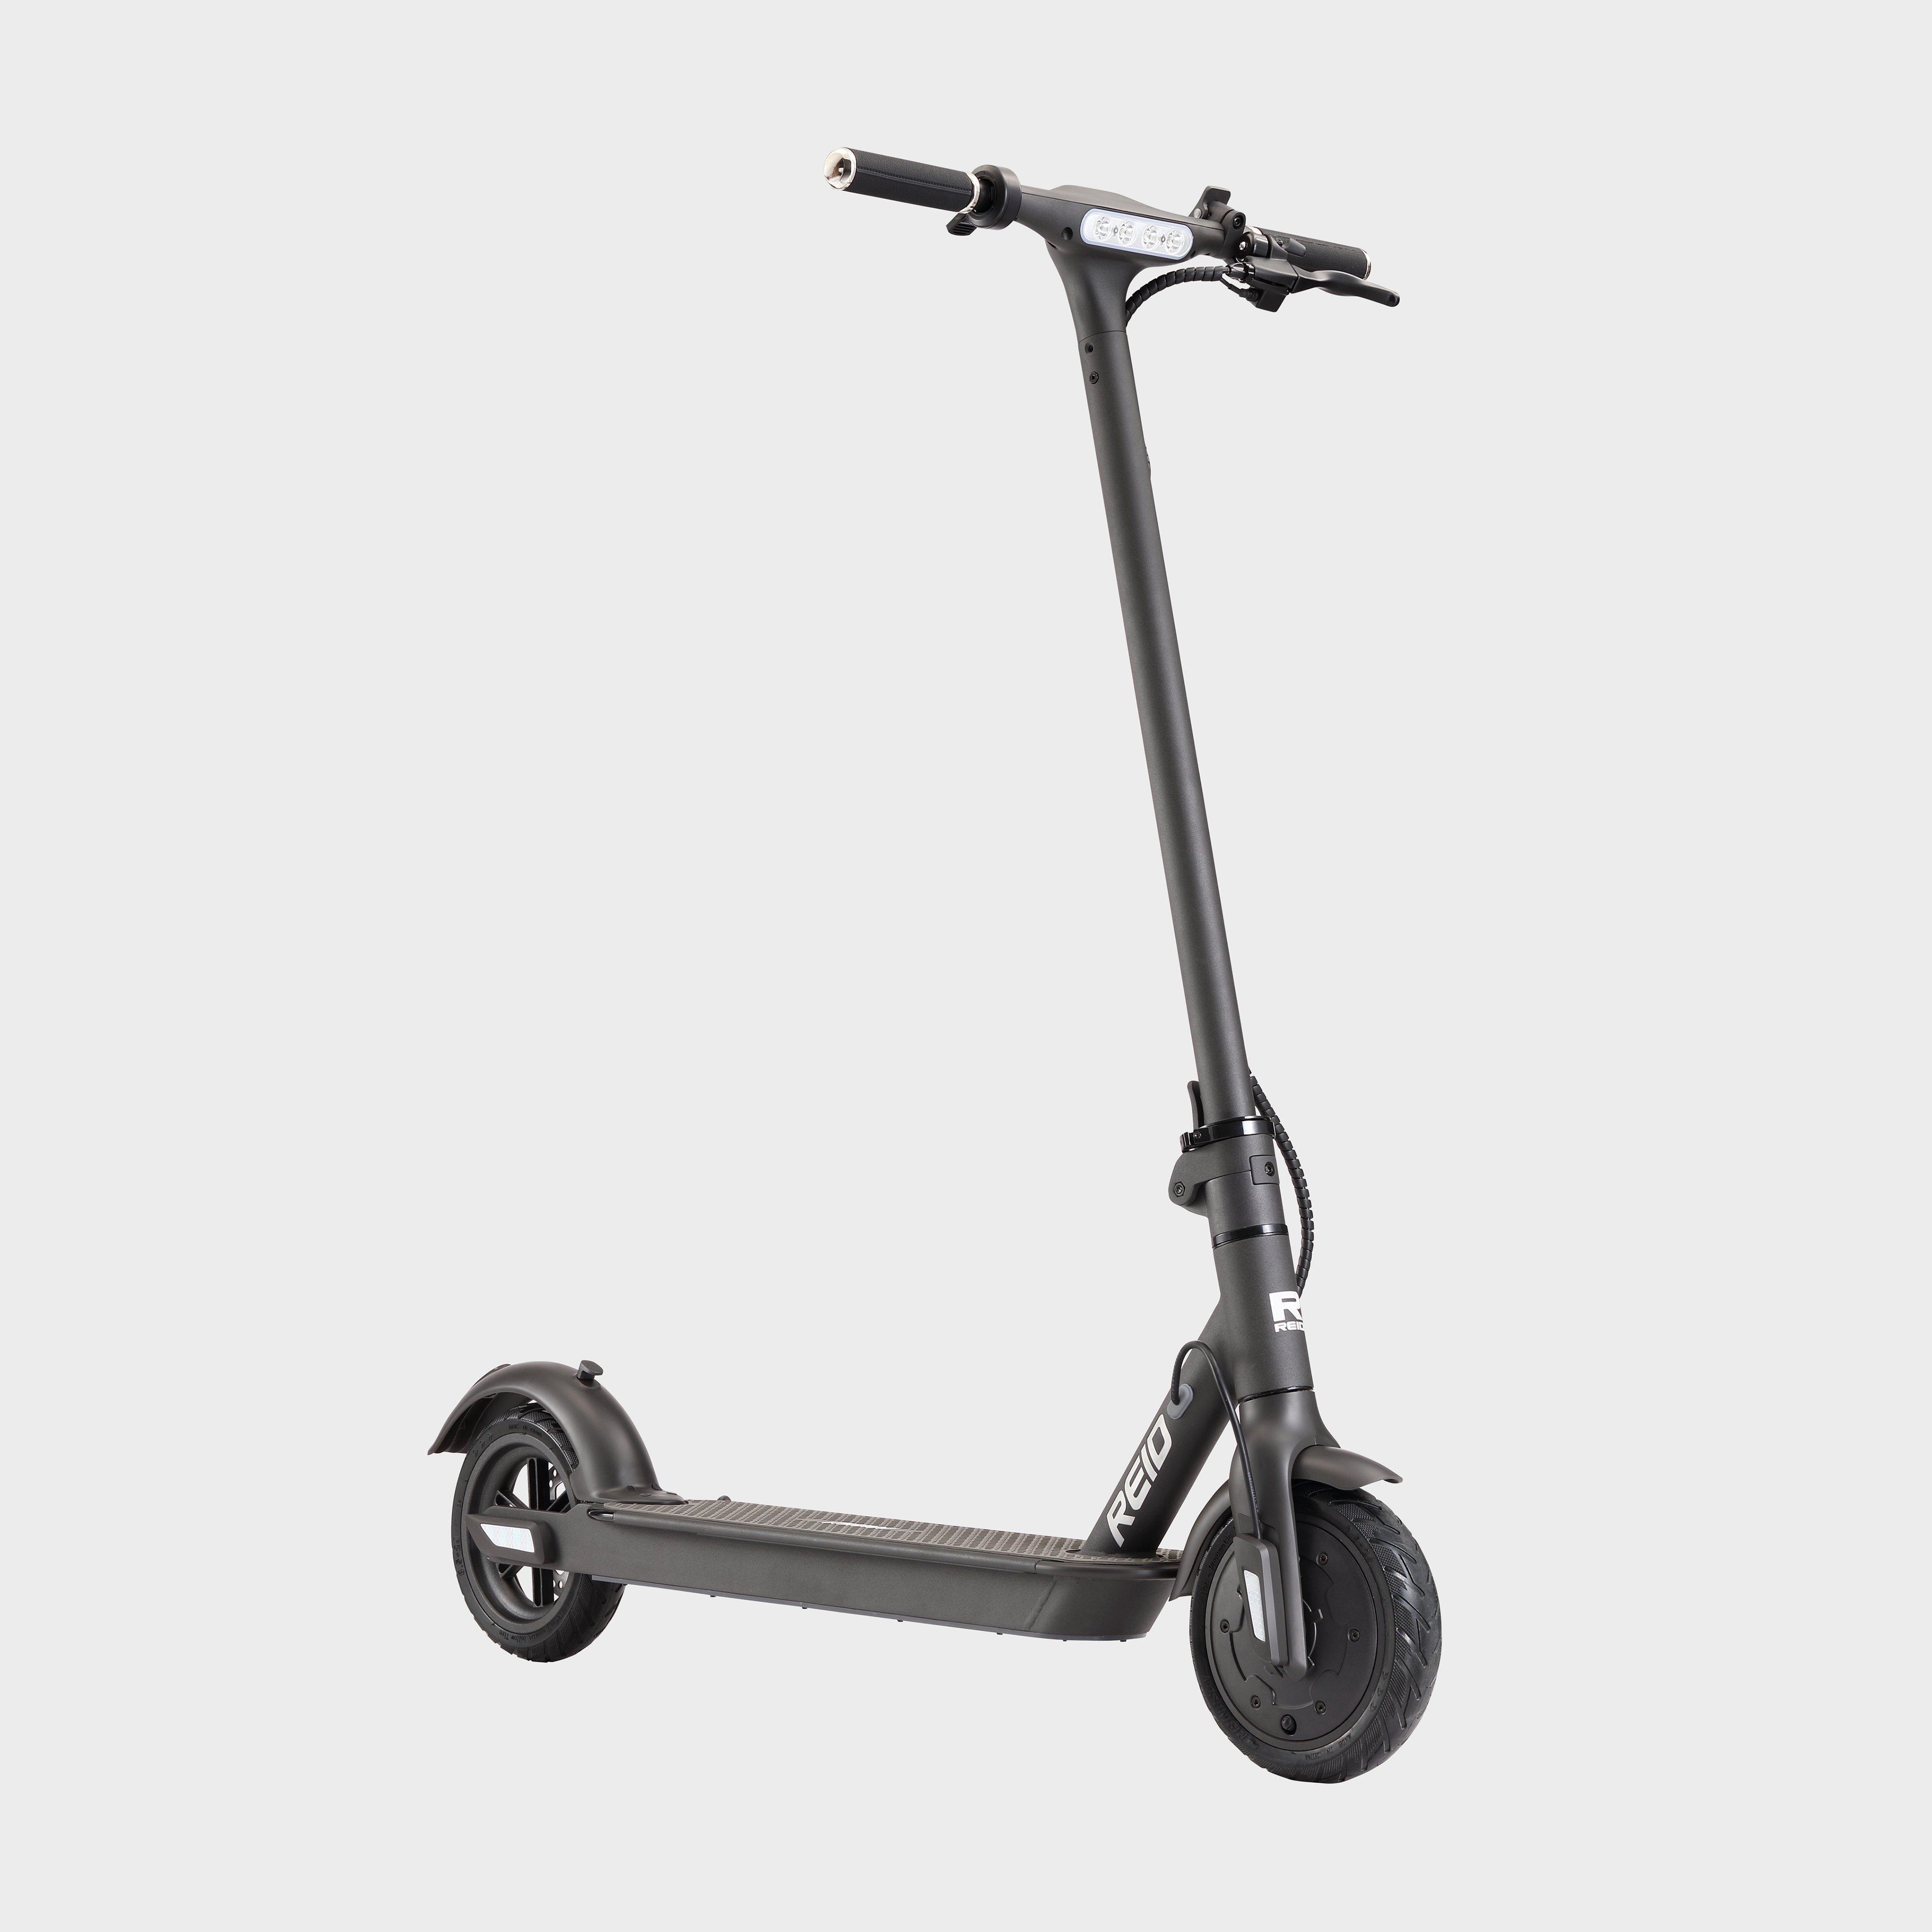 Reid E4 Plus E-Scooter - Black/E-Scooter, Black